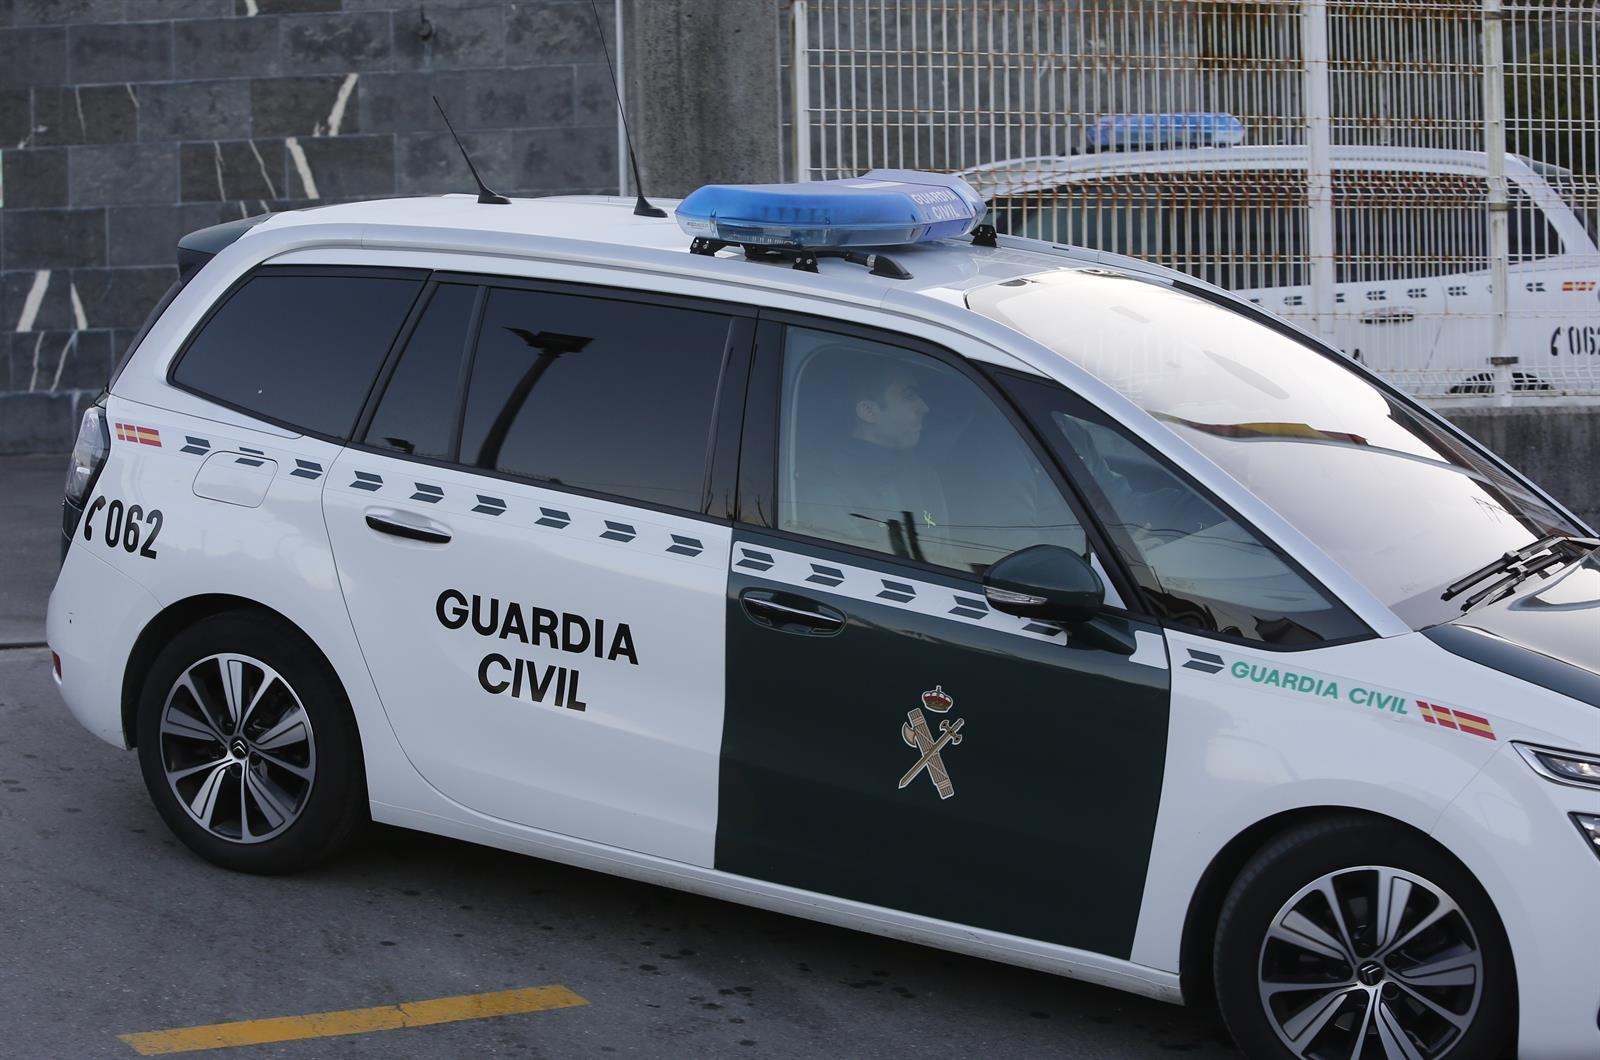 La Guardia Civil vigila el albergue para inmigrantes en cuarentena en Víznar